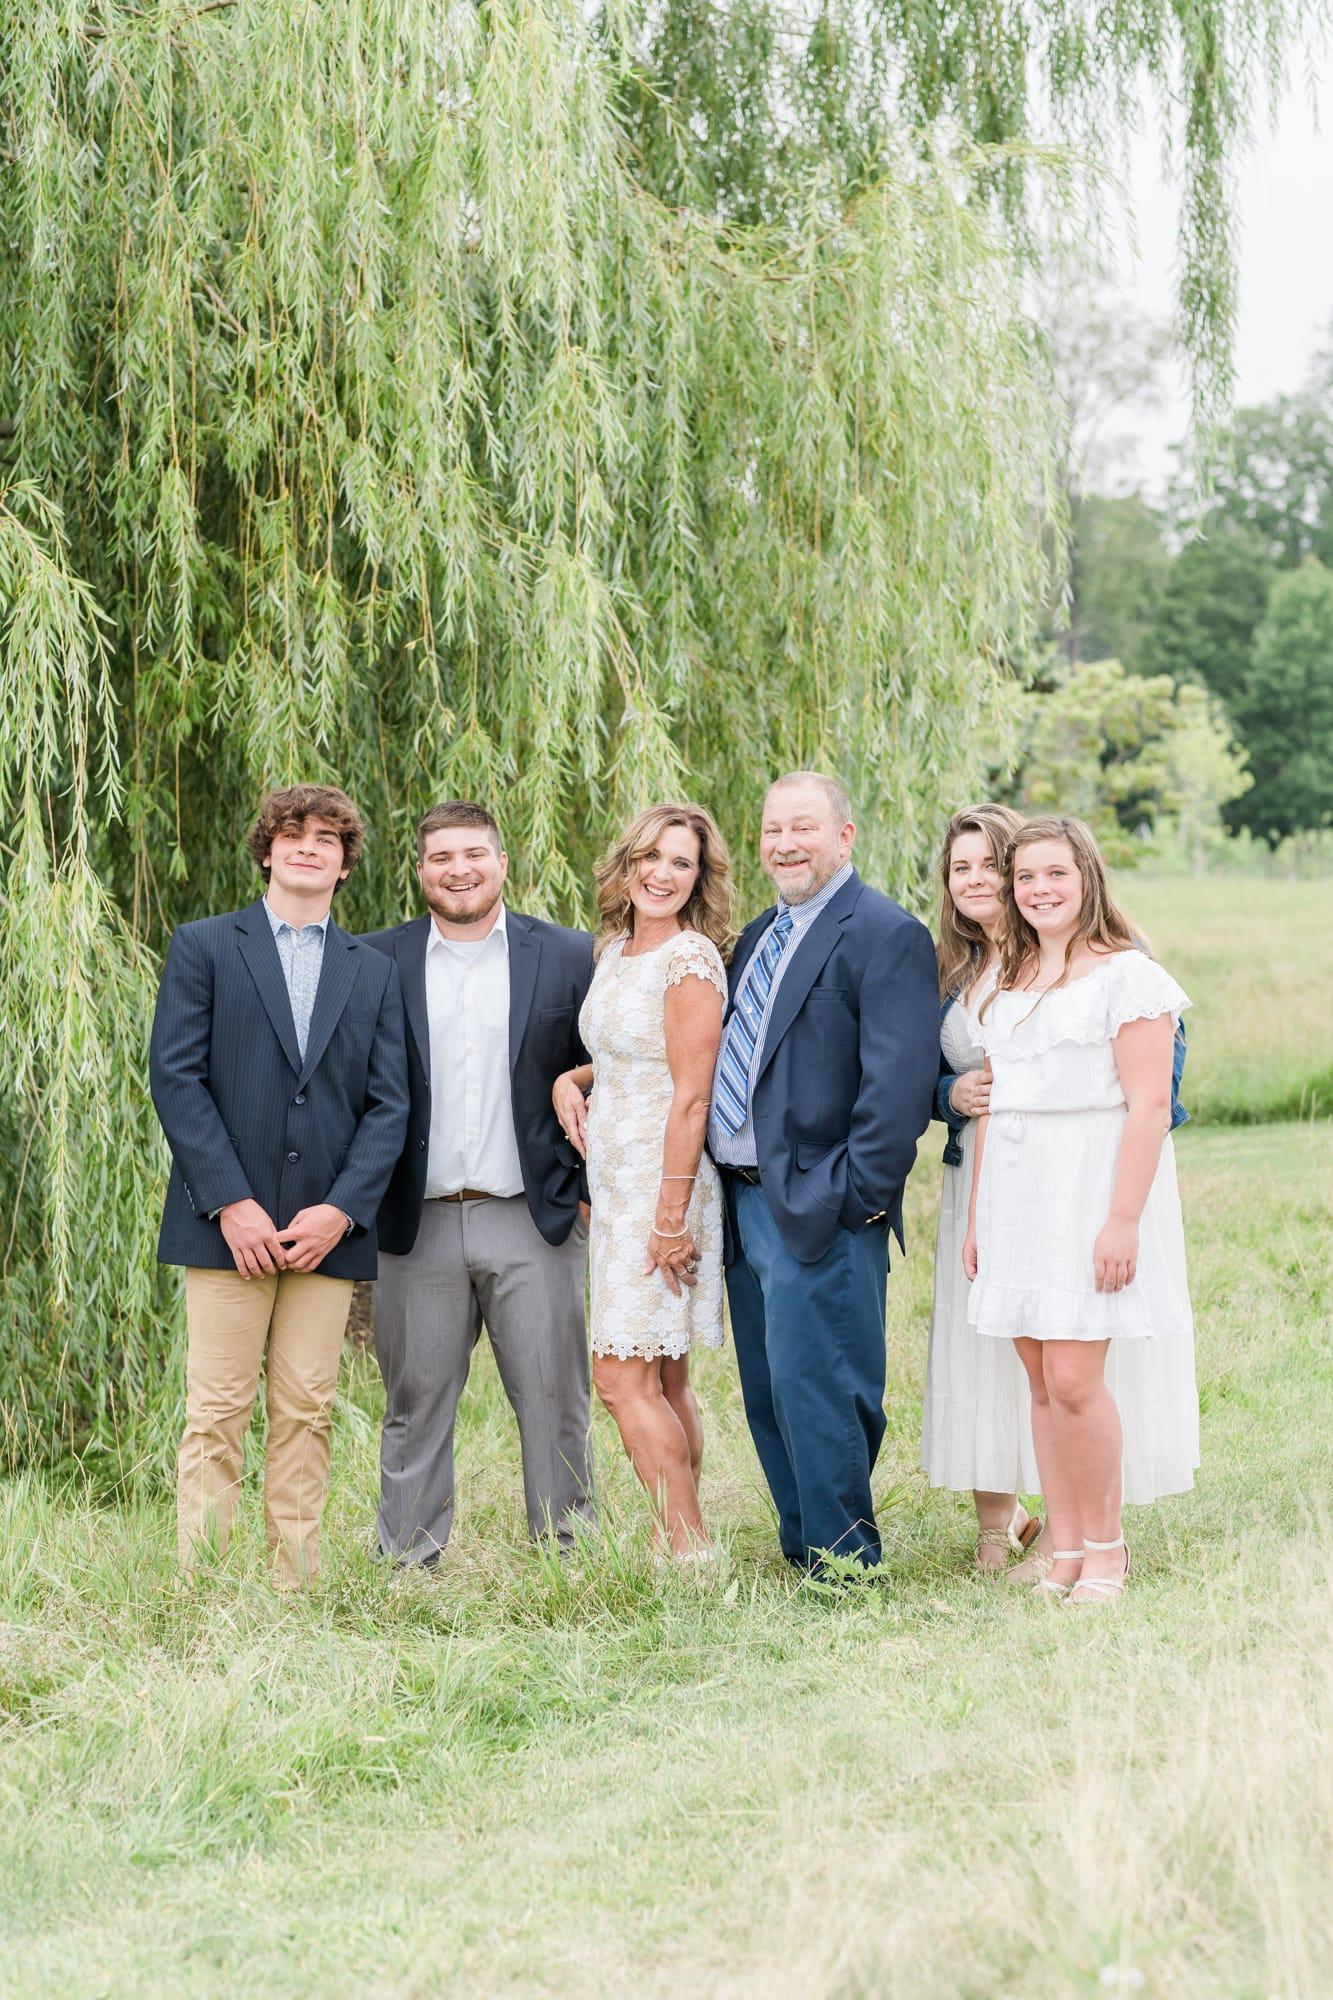 Family portrait at Penn State arboretum